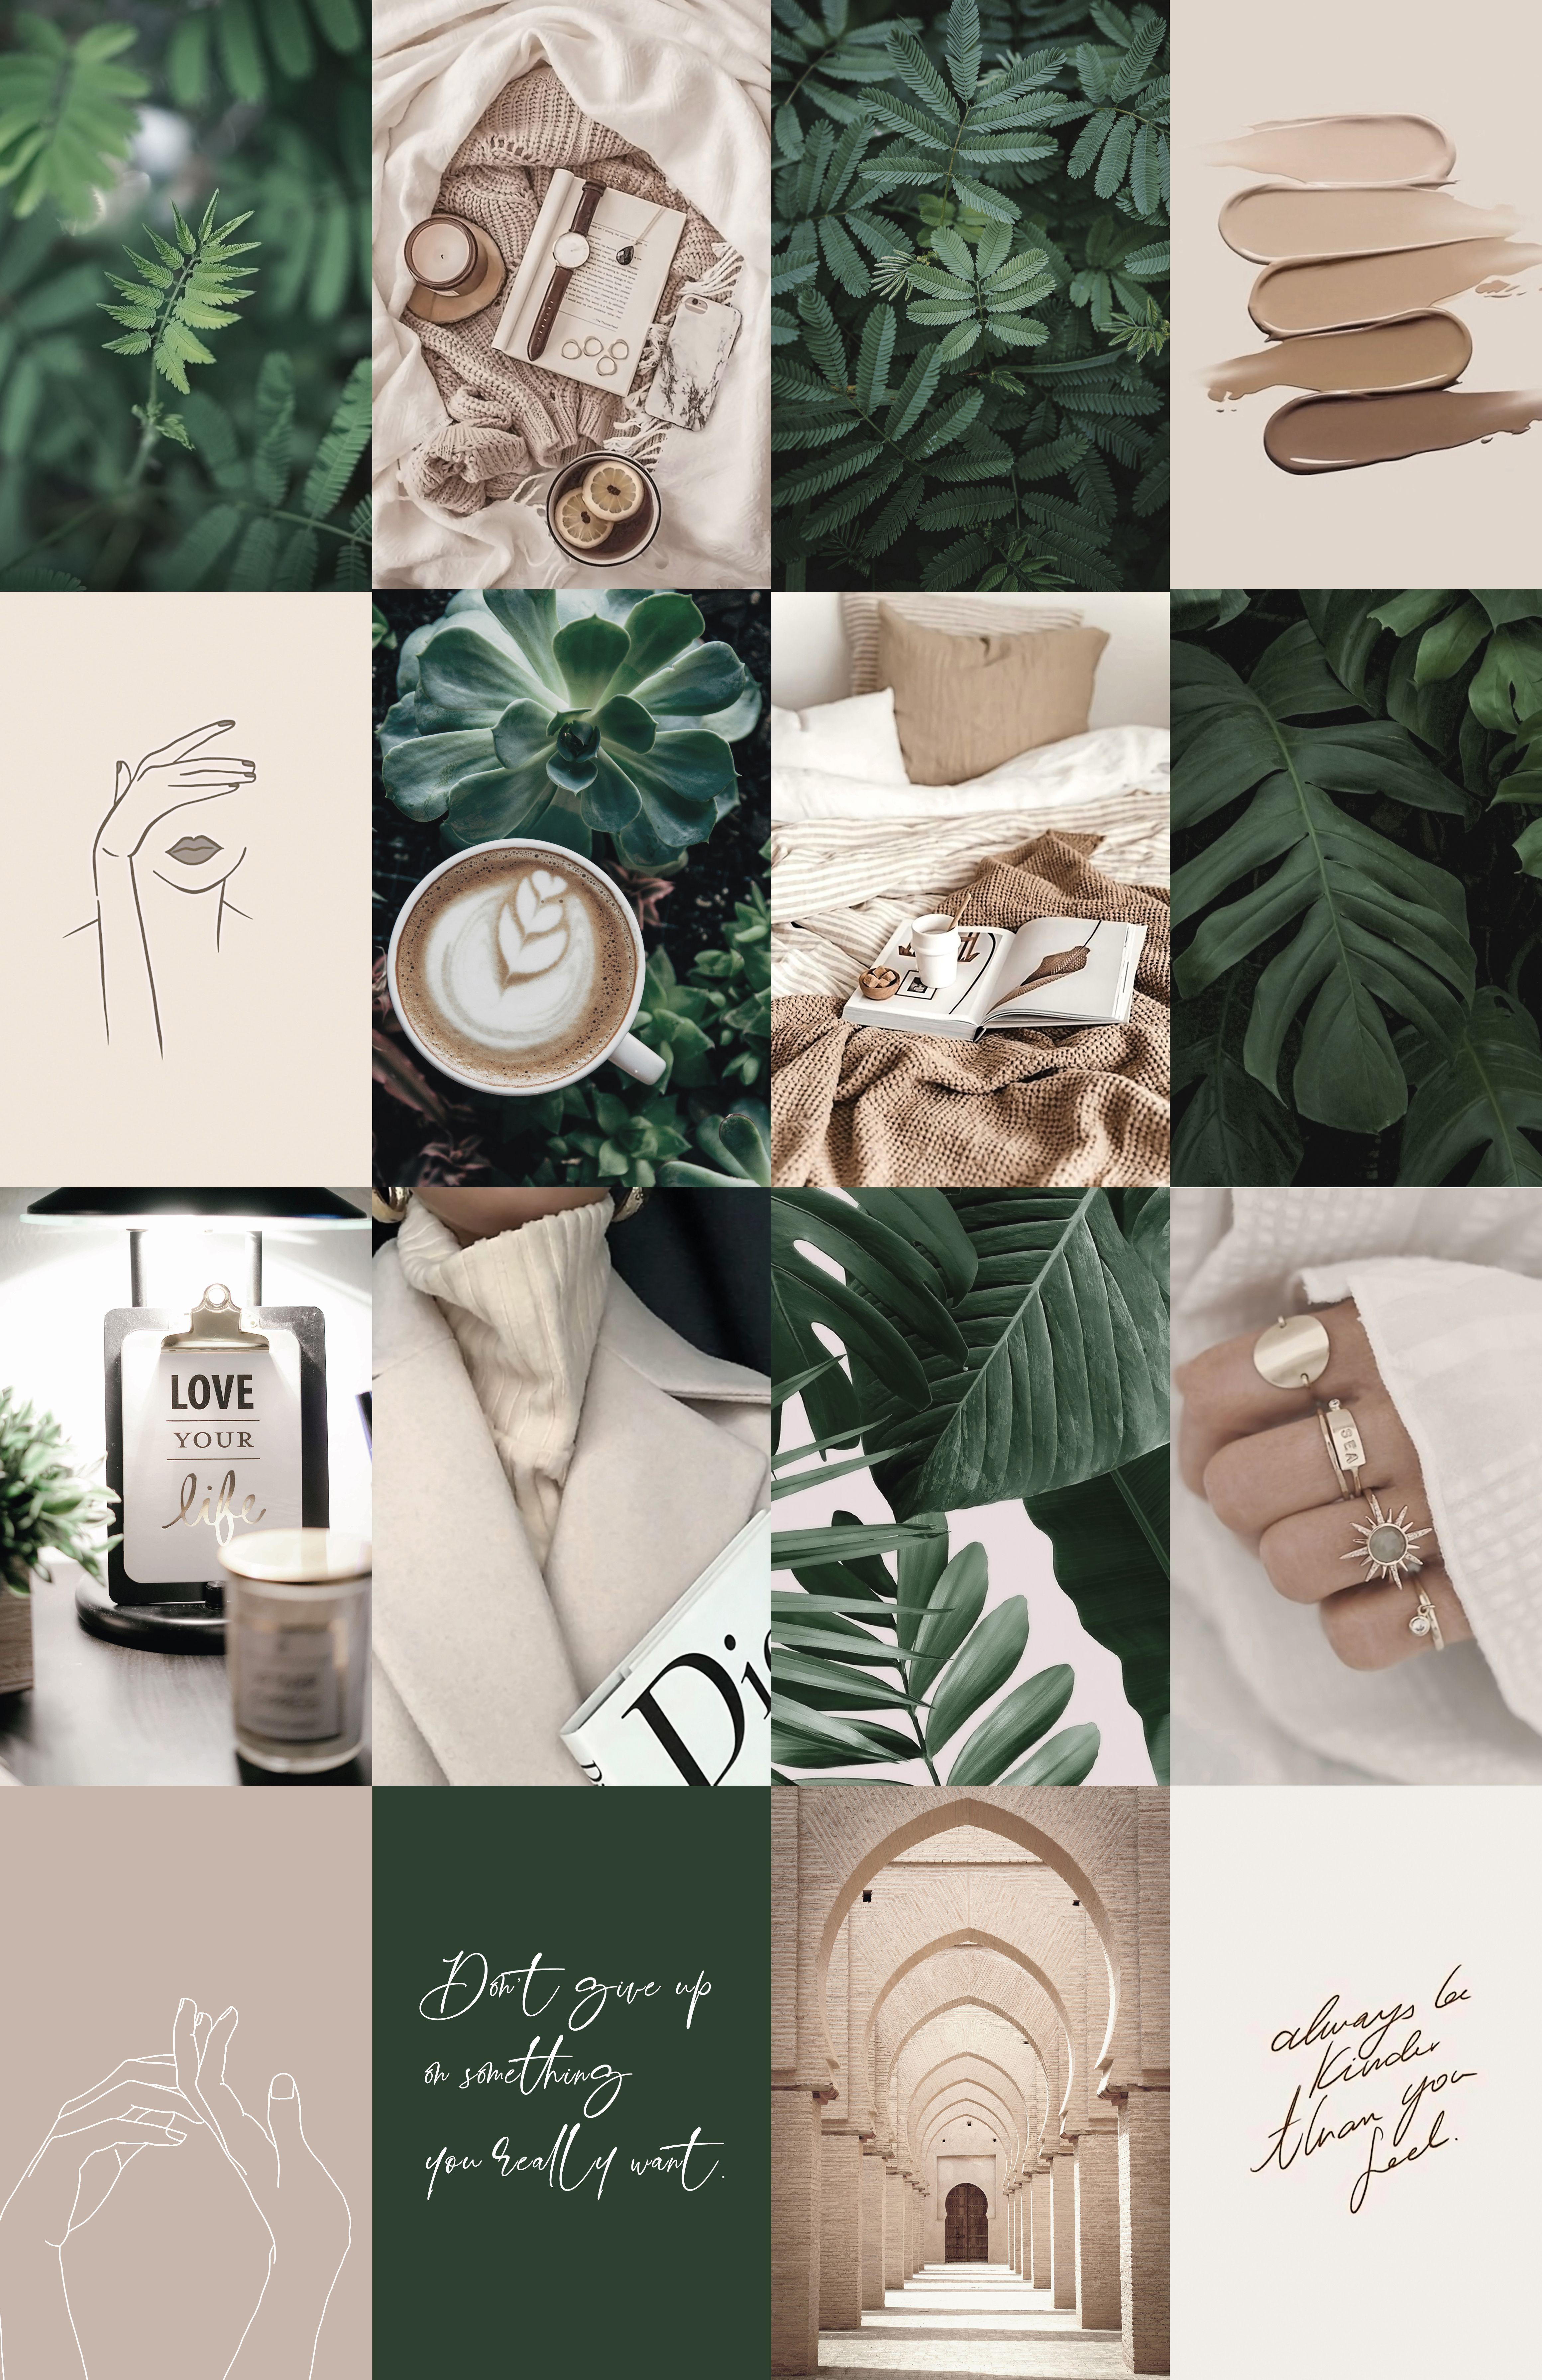 Boho Boujee Botanical Wall Collage Kit, Green Beige Aesthetic Photo Collage Kit, Printable Collage